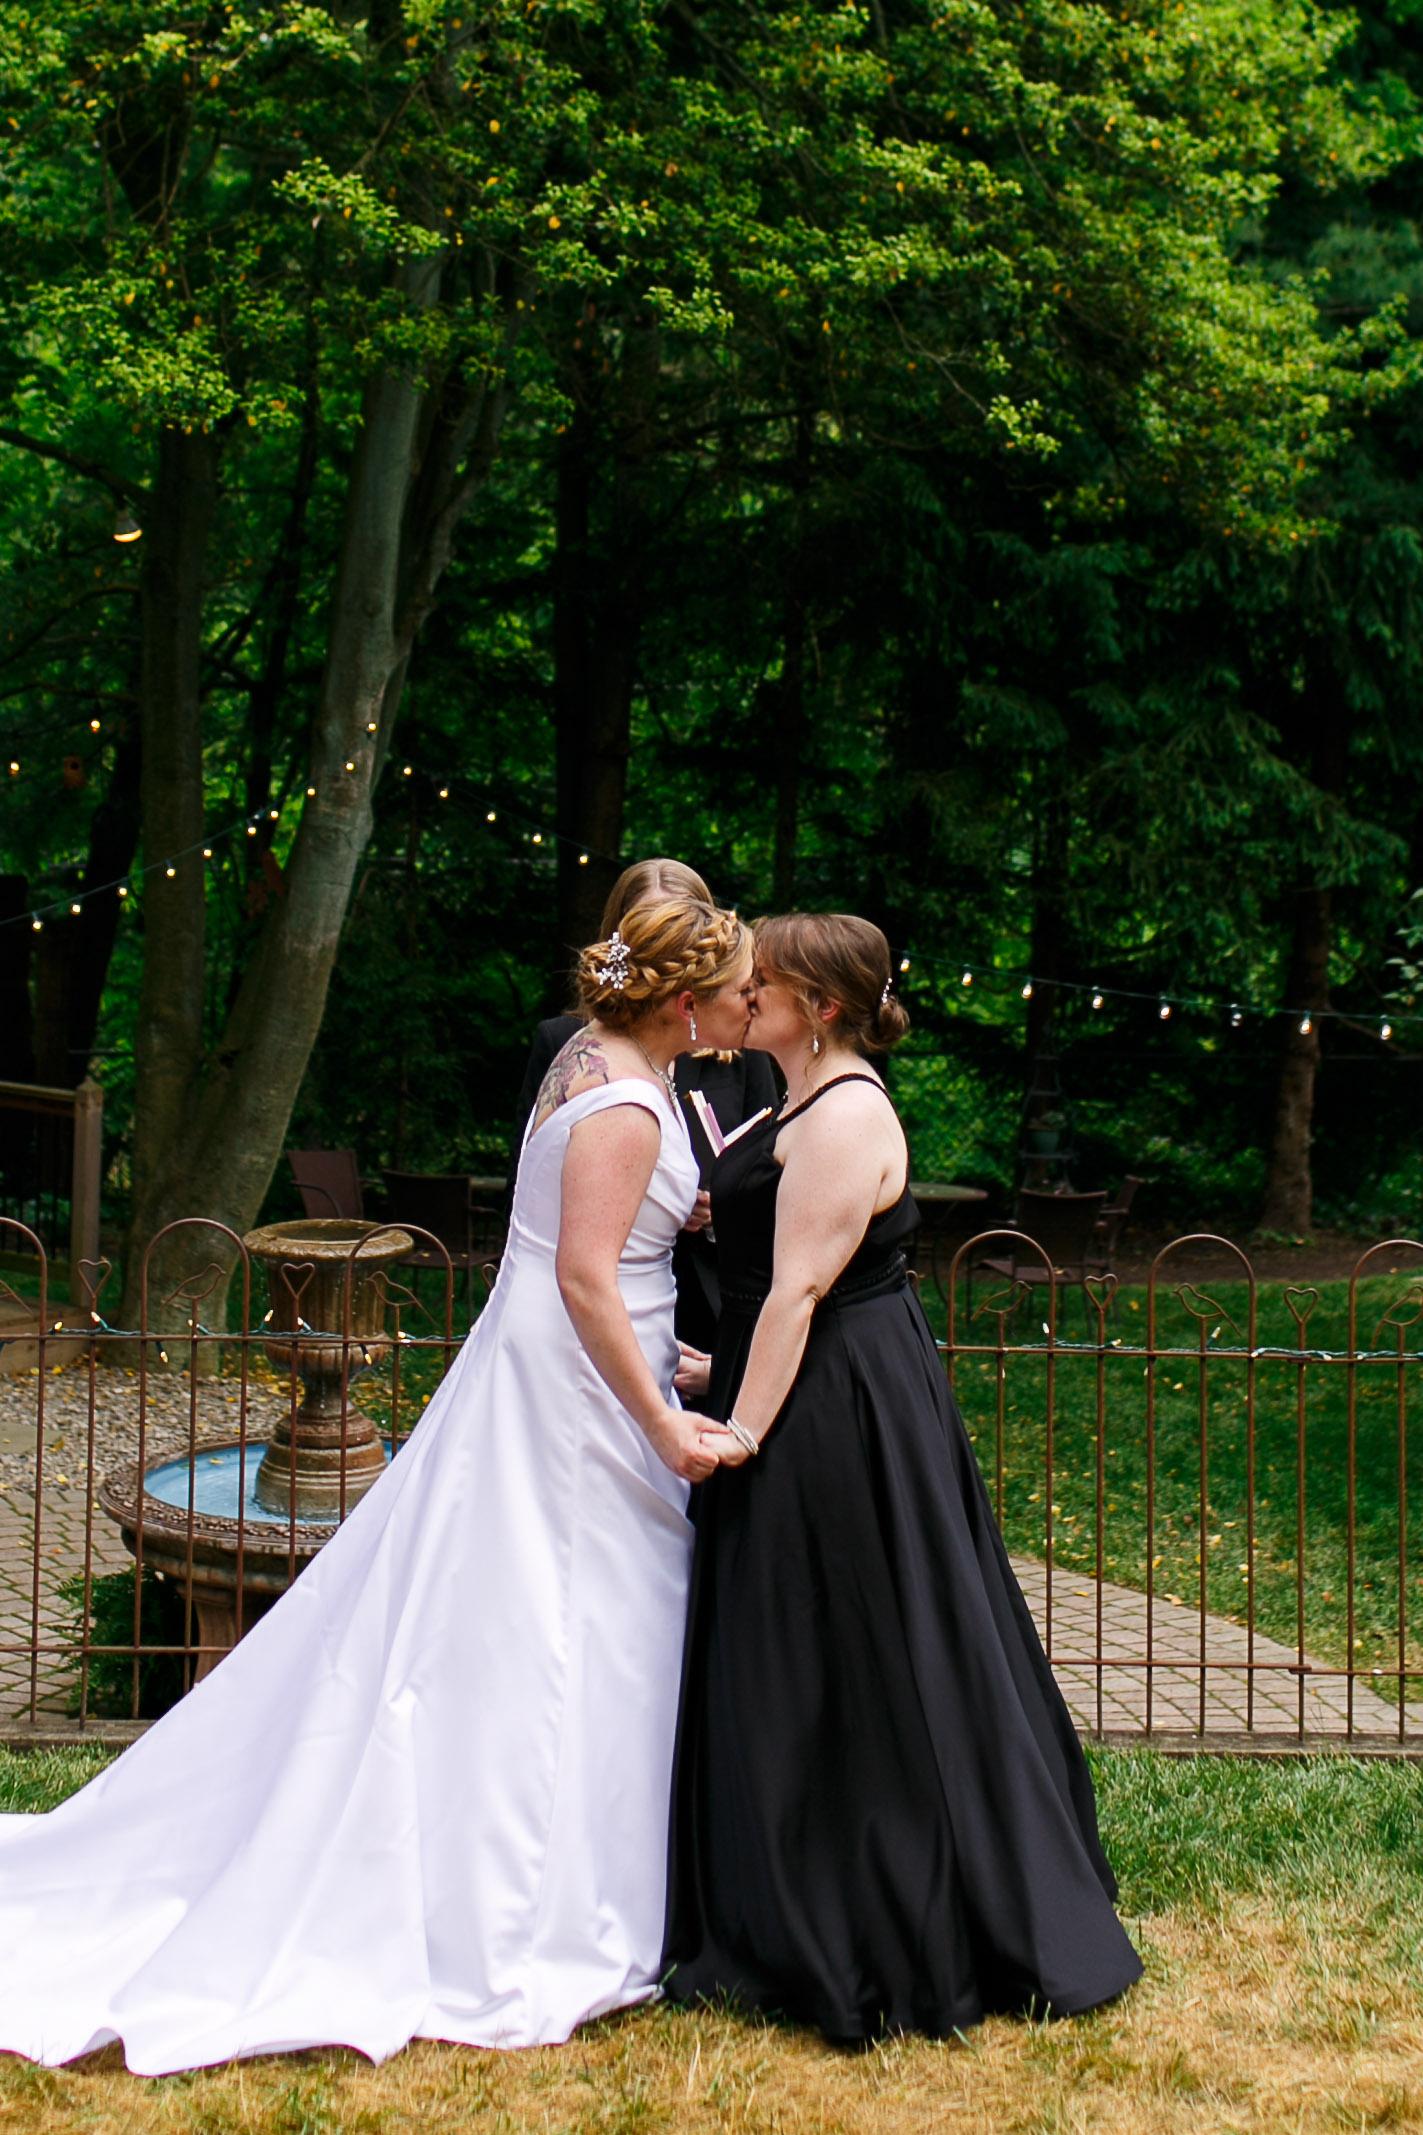 N&J Sage Farmhouse PA LGBTQ Wedding-443.jpg